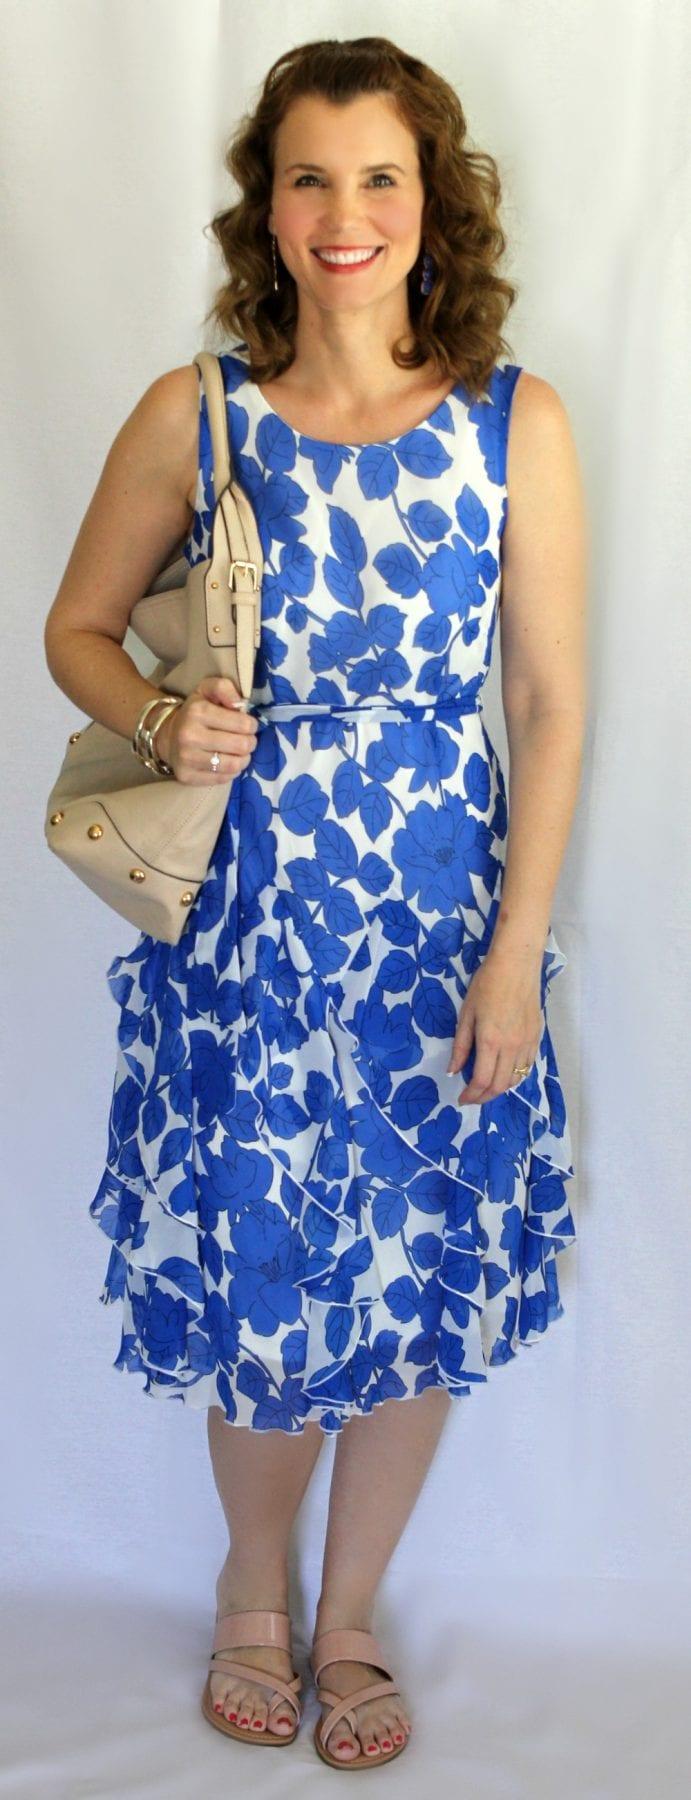 Summer Dress: Royal Blue Floral Print Corkscrew Dress from Chadwicks.